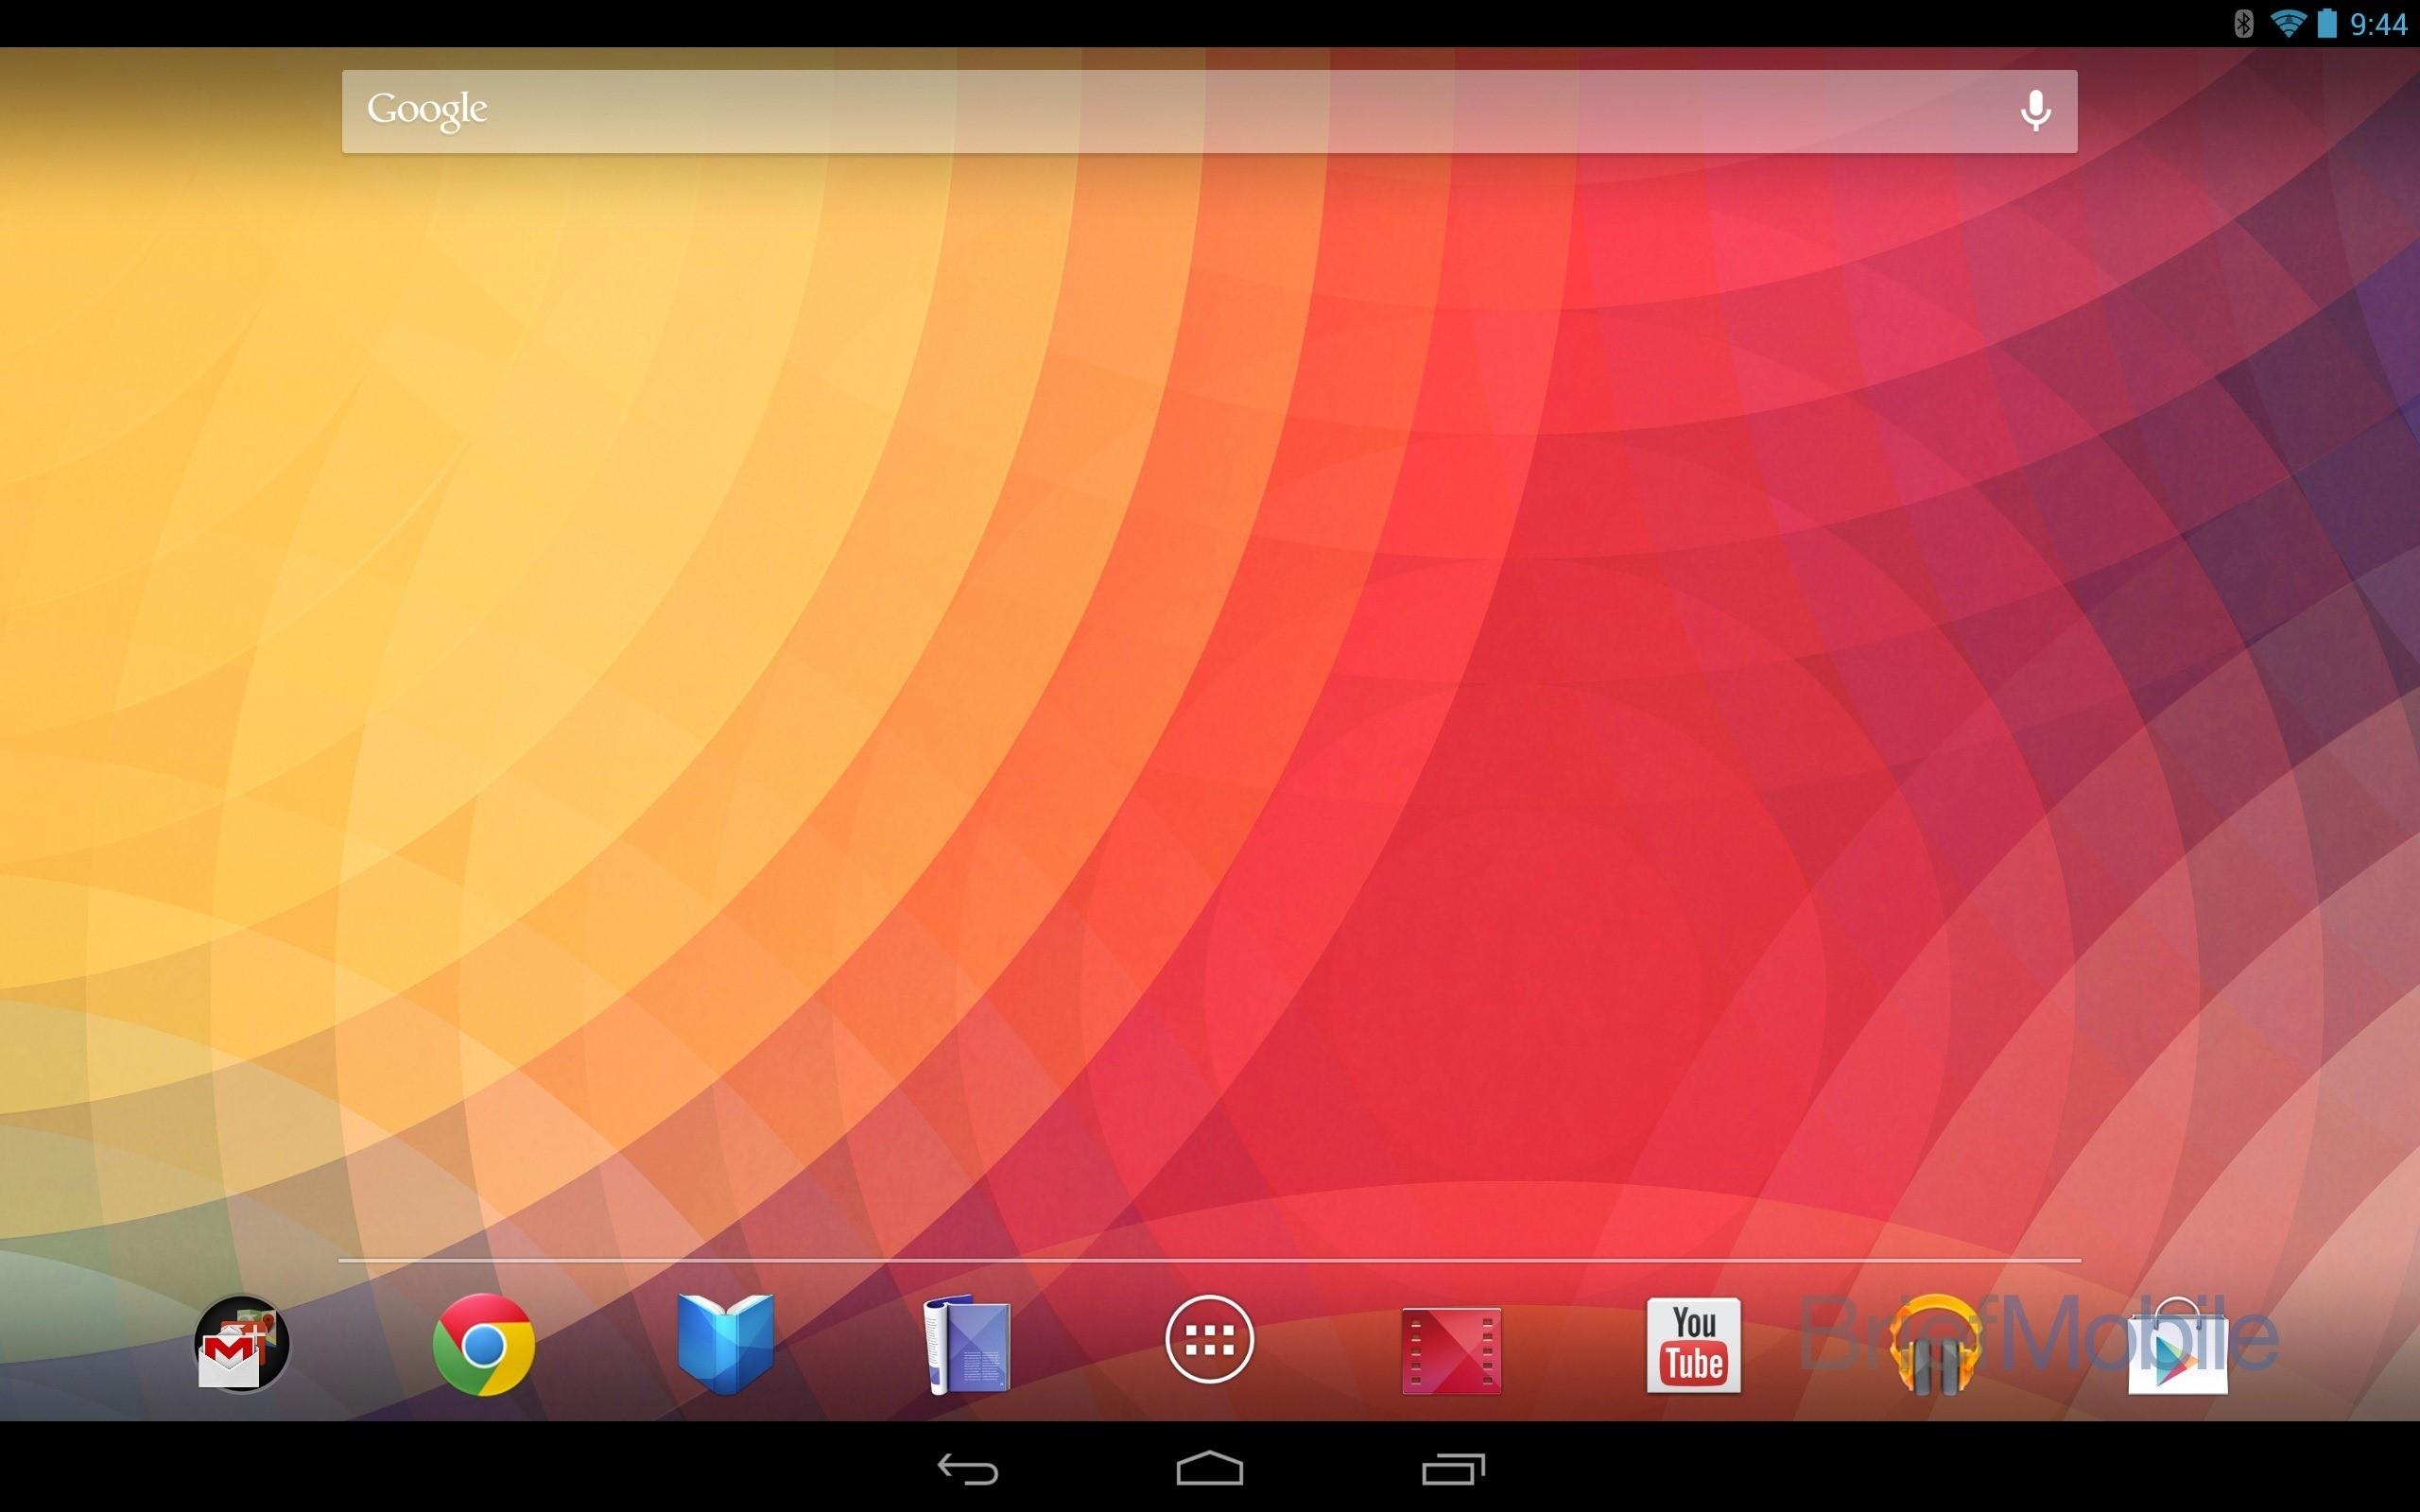 Android Tablet UI: Classica o Ibrida? [SONDAGGIO]